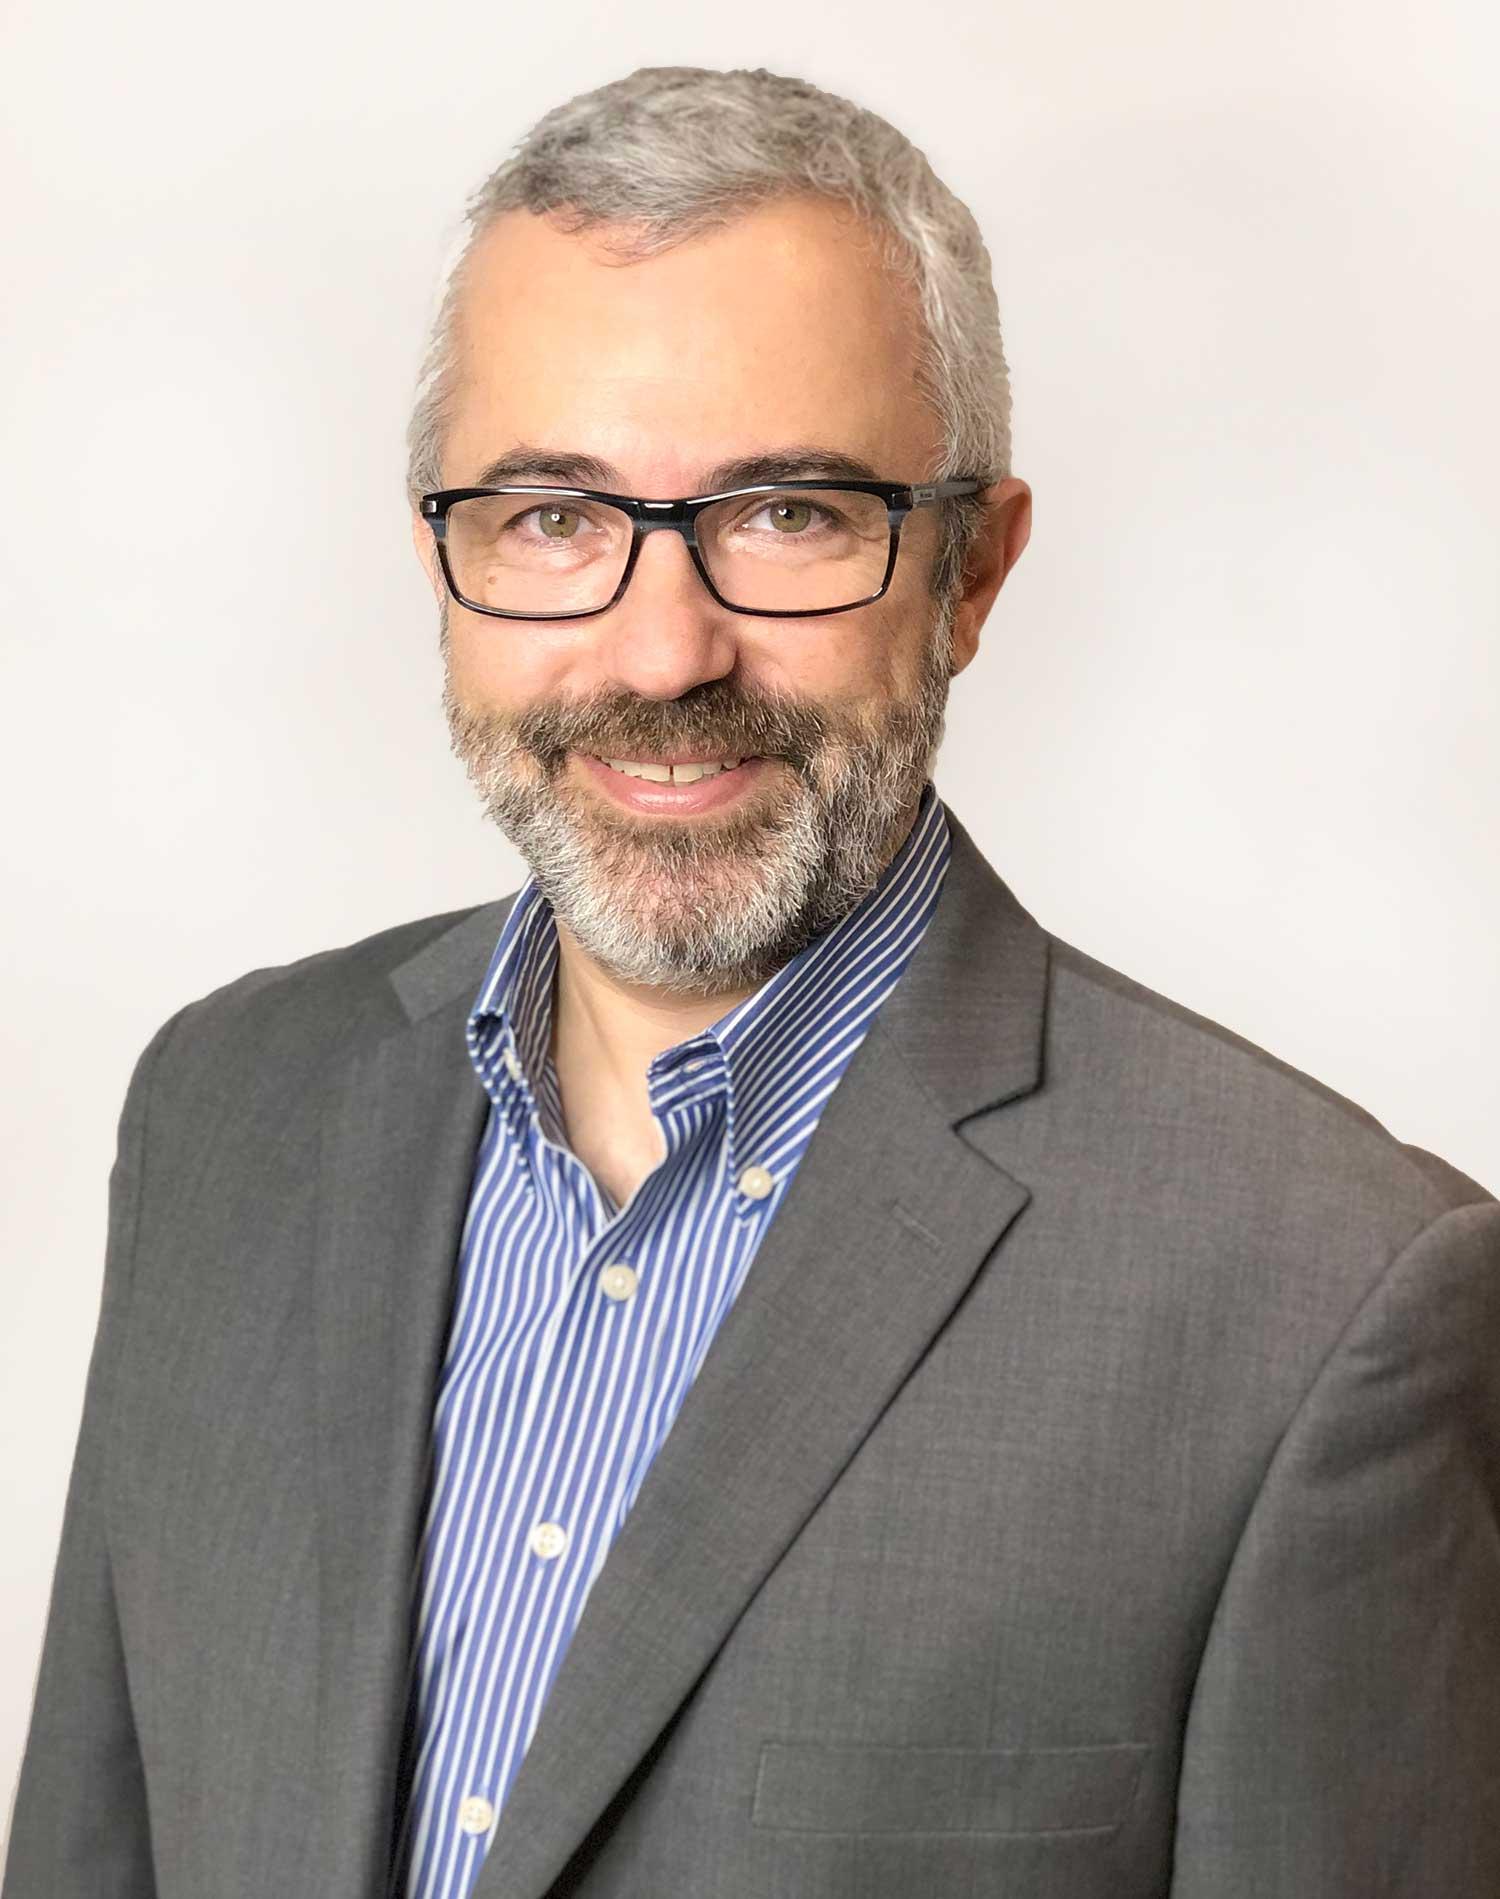 STYLIANOS G. VAYANOS